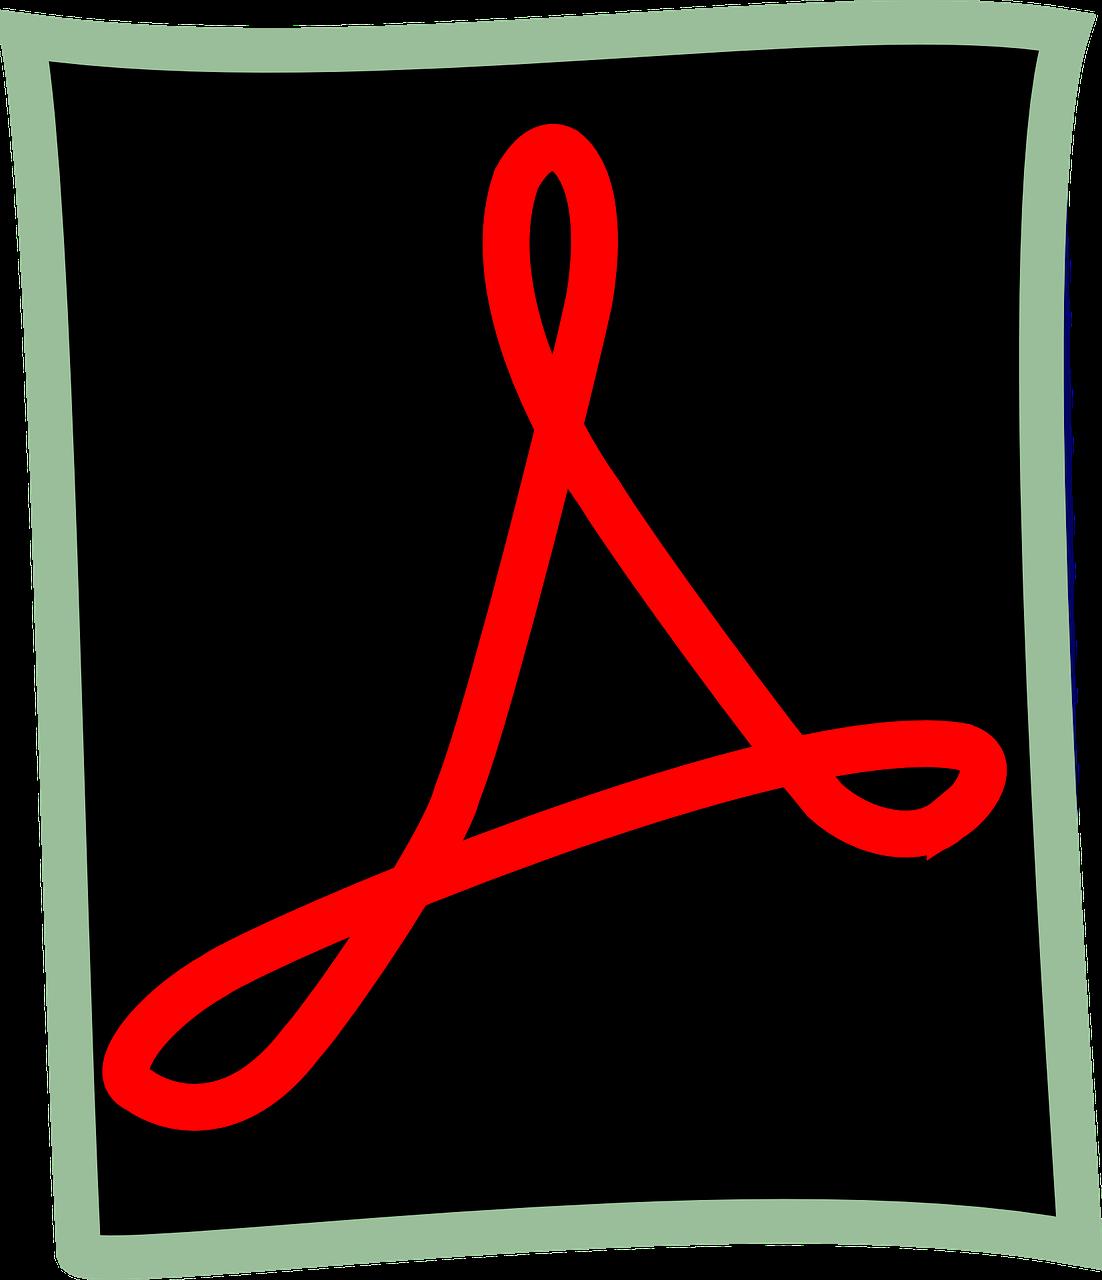 acrobat-reader-303805 1280